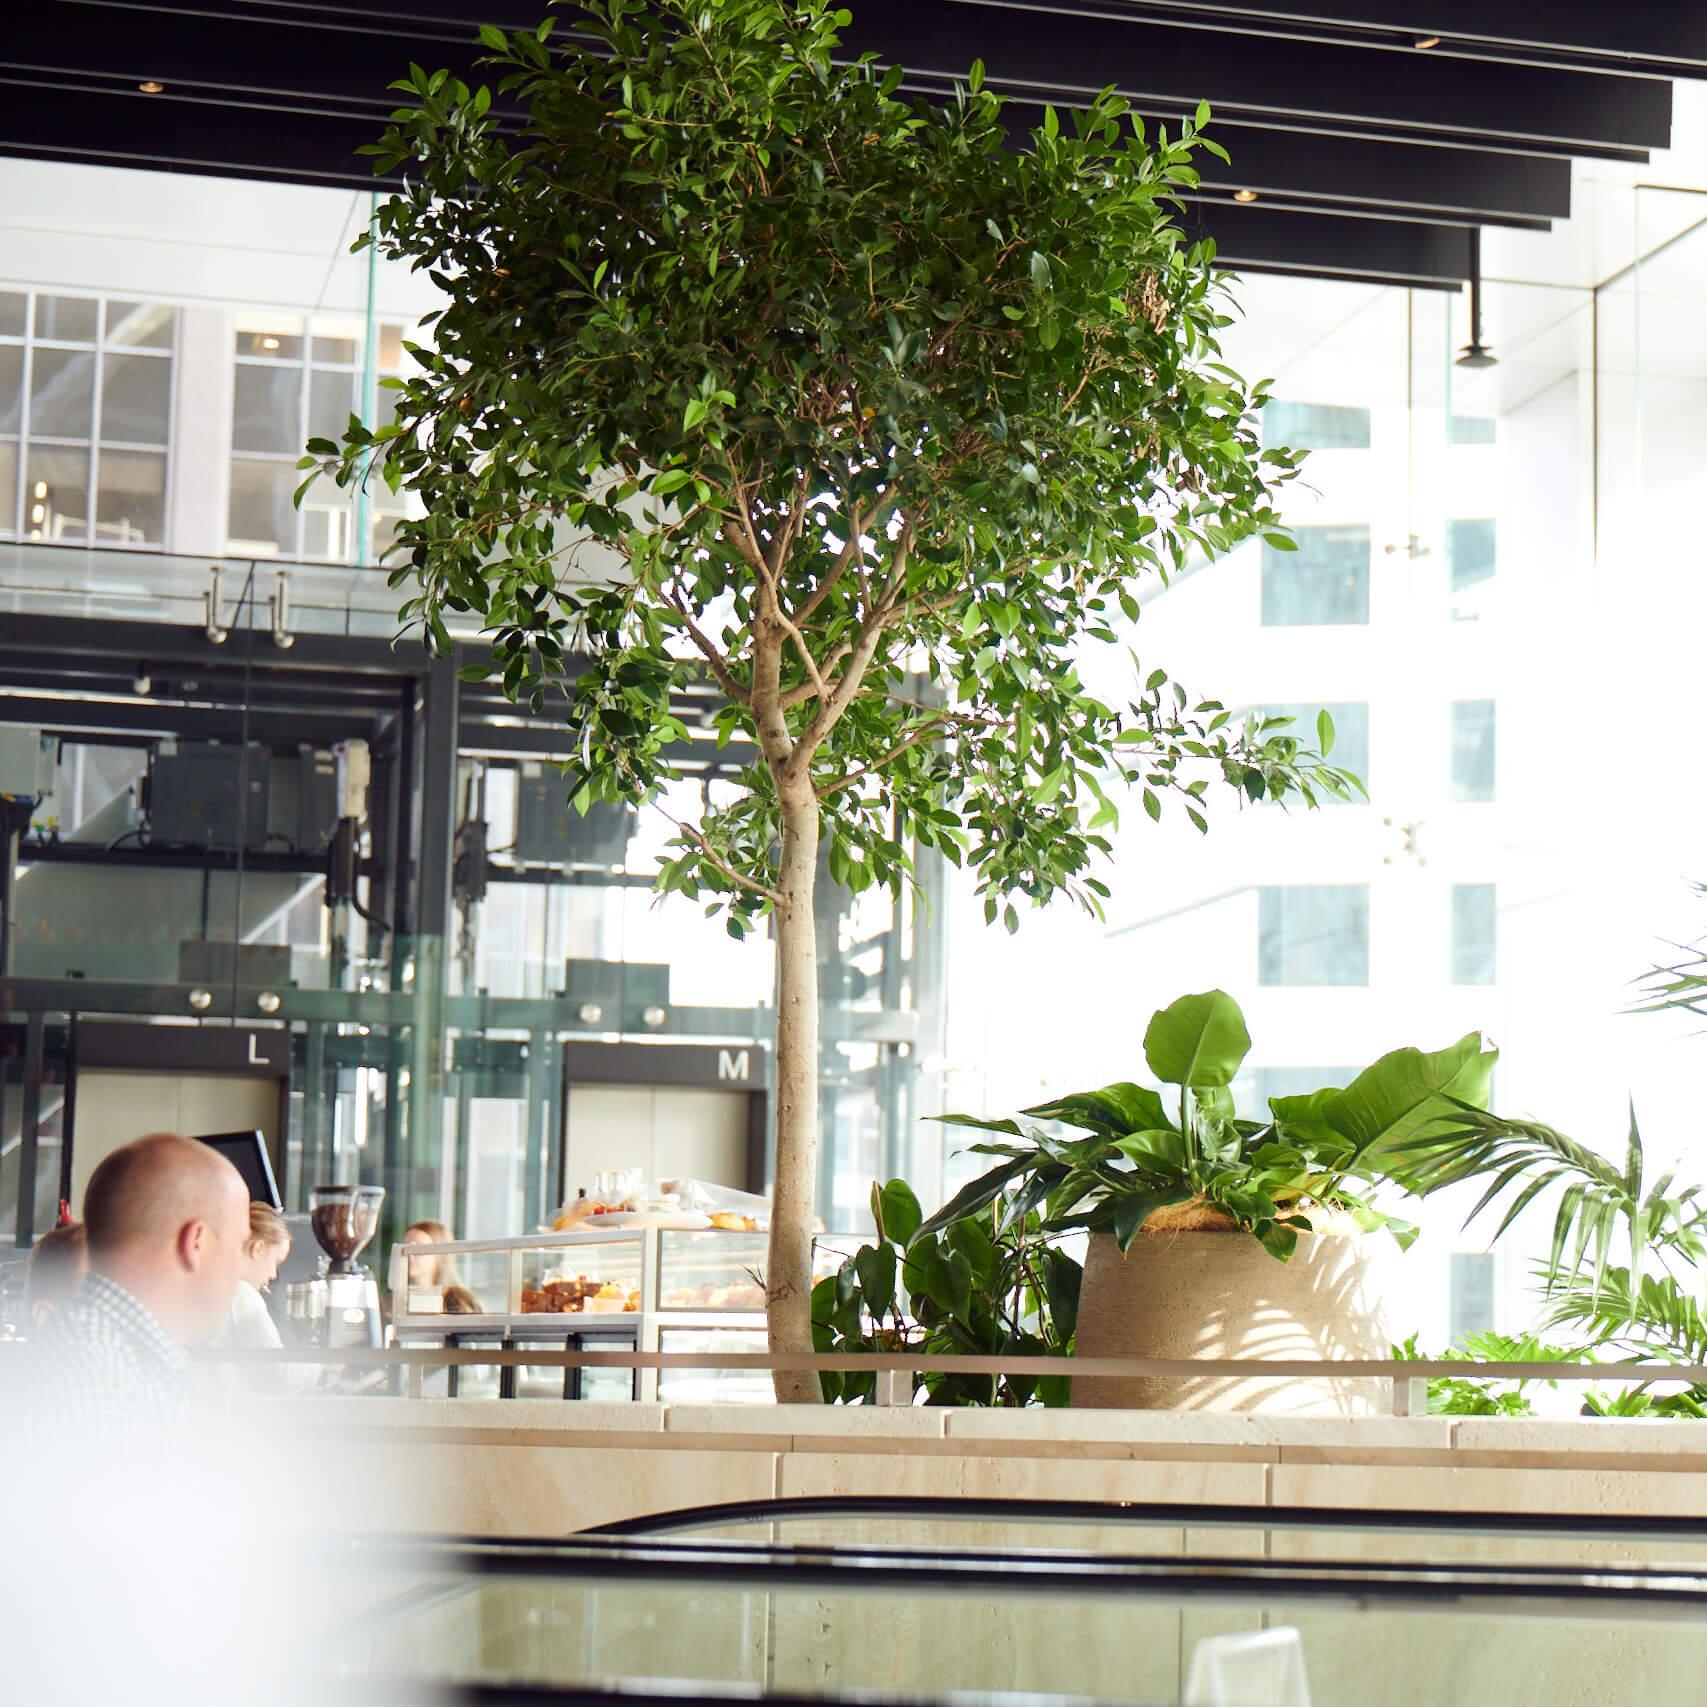 portfolio-offices-spaces-commercialbay-image6